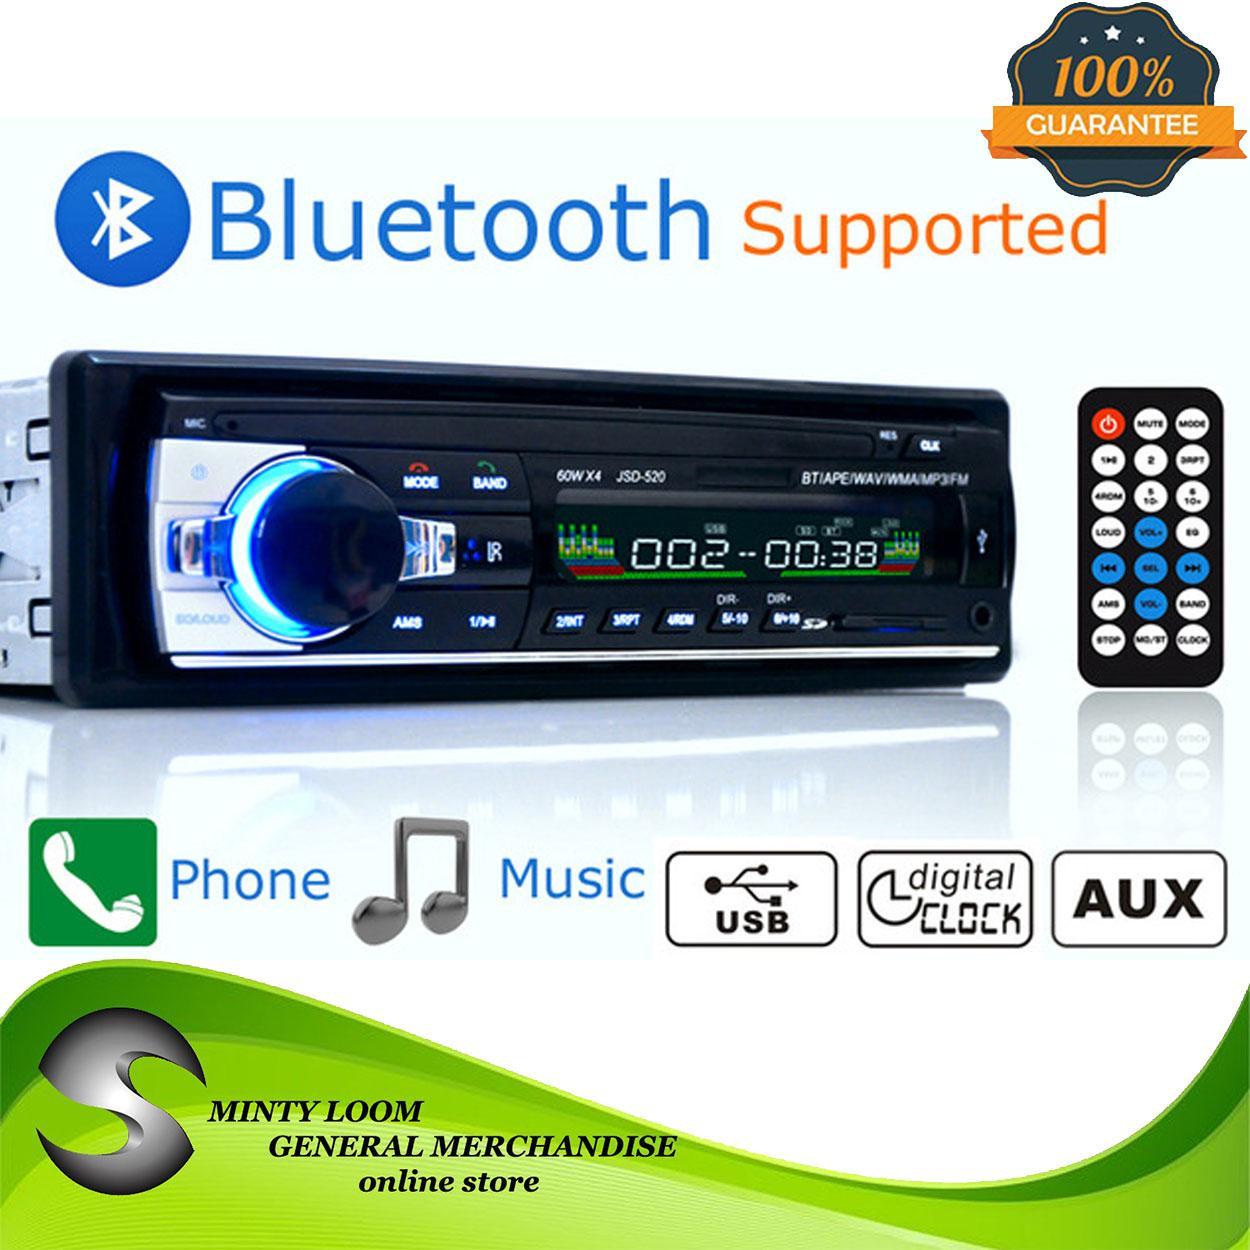 Car Radio 1Din AUX\USB Phone Charge\FM\Bluetooth\Card Play \Remote  Control\Handsfree MP3 Multimedia Player AutoRadio